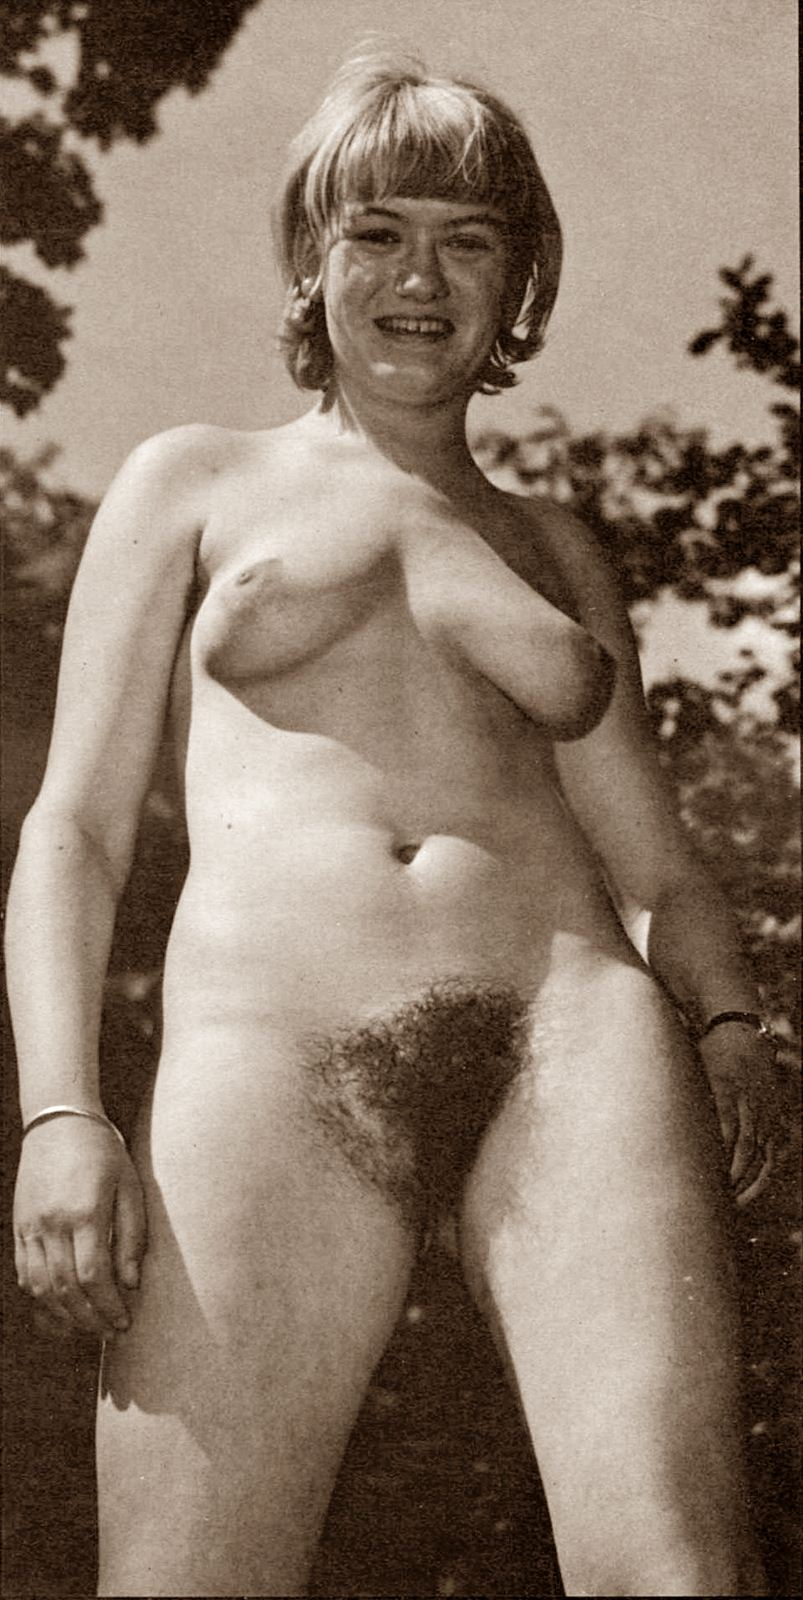 https://www.nudismlife.com/galleries/nudists_and_nude/the_most_natural_nudists/the_most_natural_nudists_0034.jpg